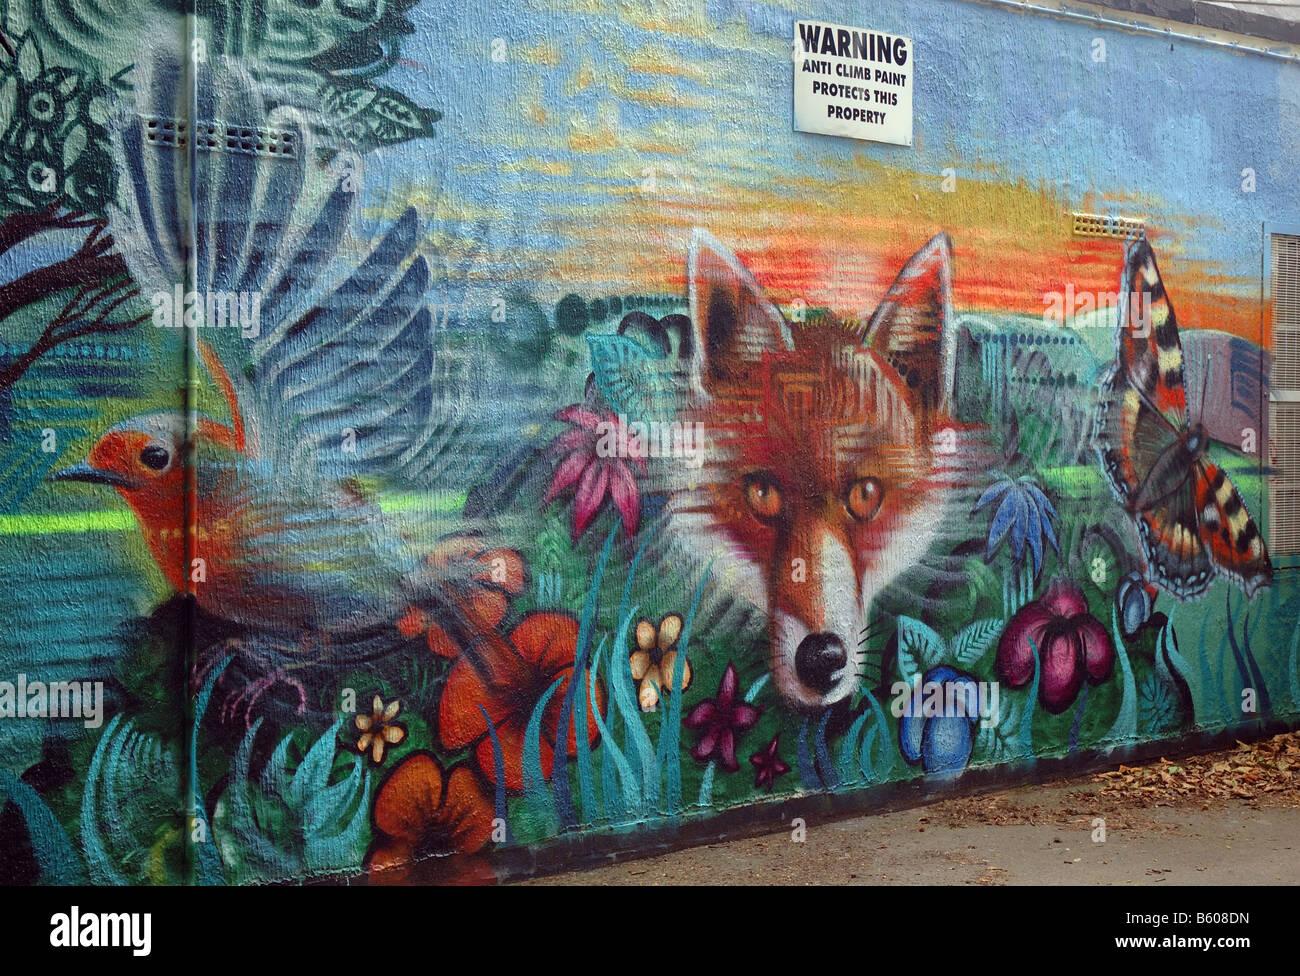 Graffiti wall uk - Graffiti Art On The Wall Of A Pavillion Knighton Lane East Aylestone Leicester England Uk